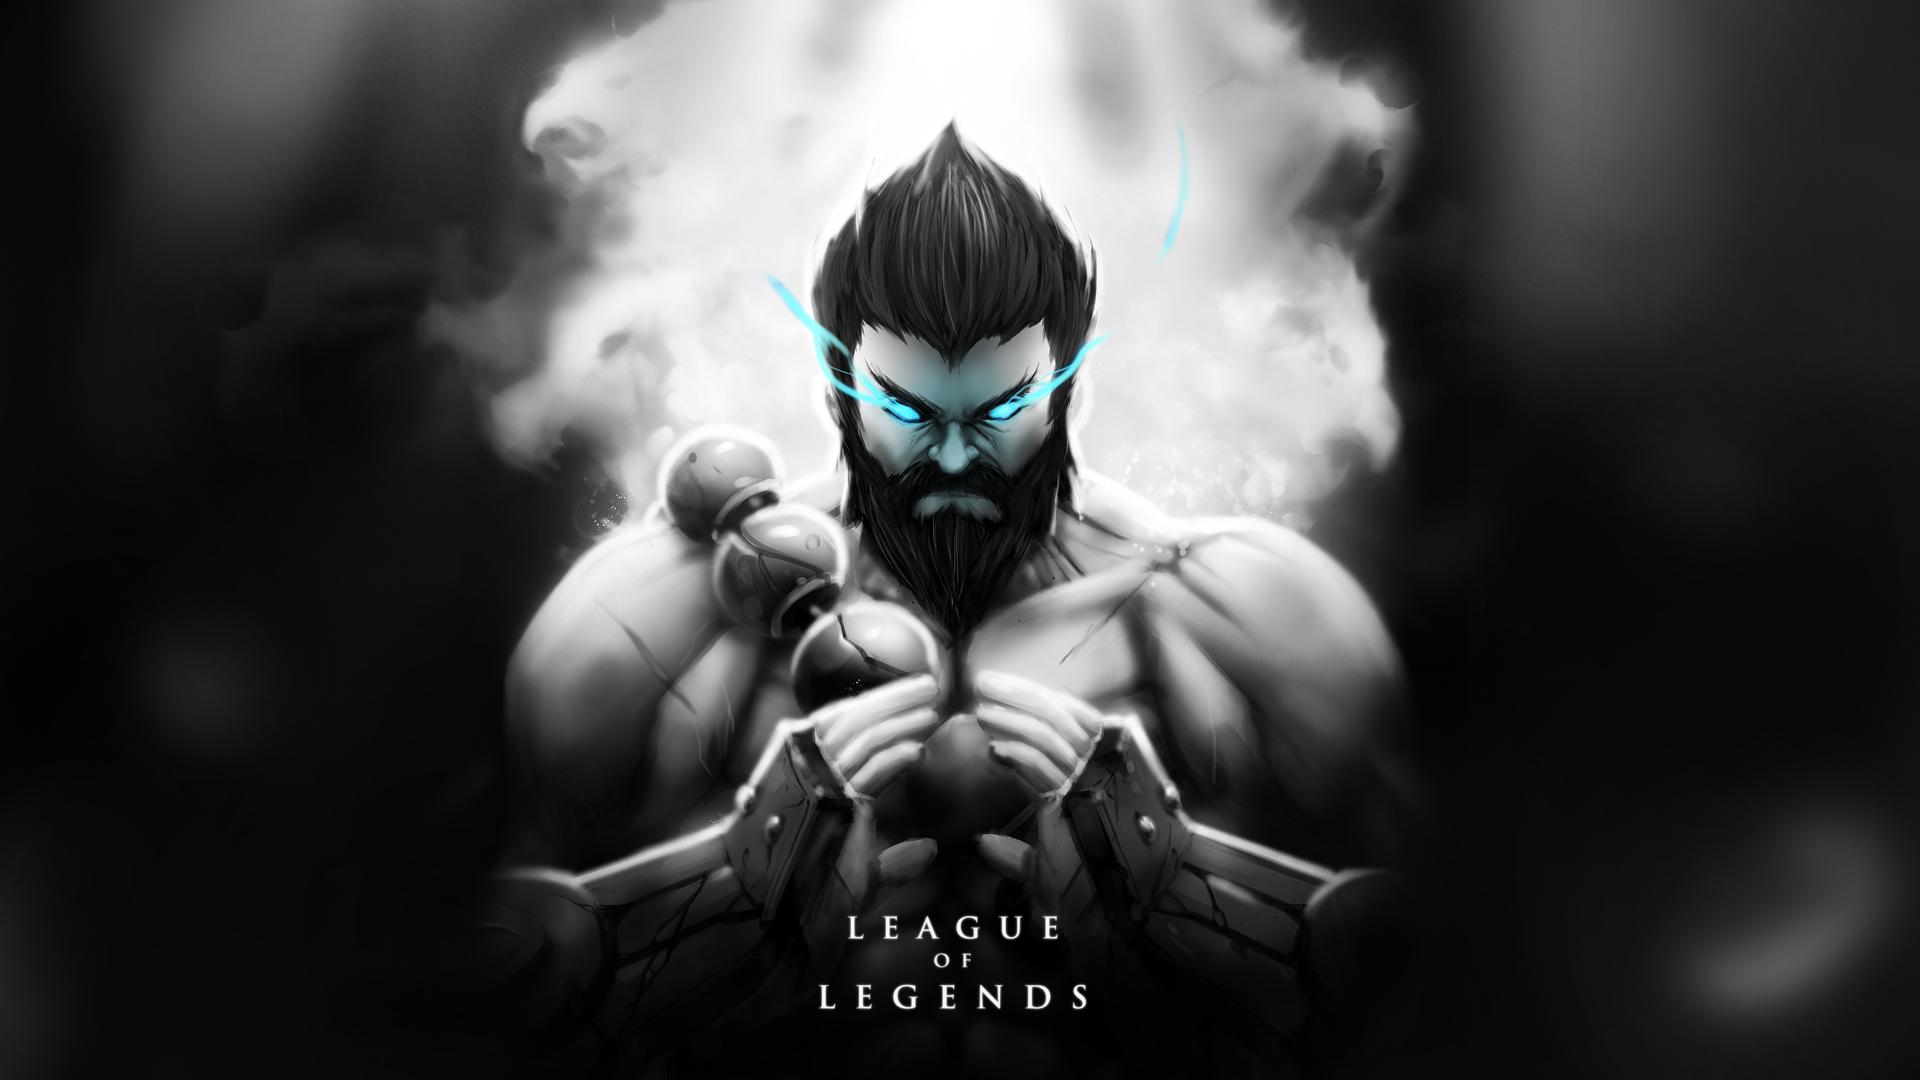 League of Legends wallpaper 91